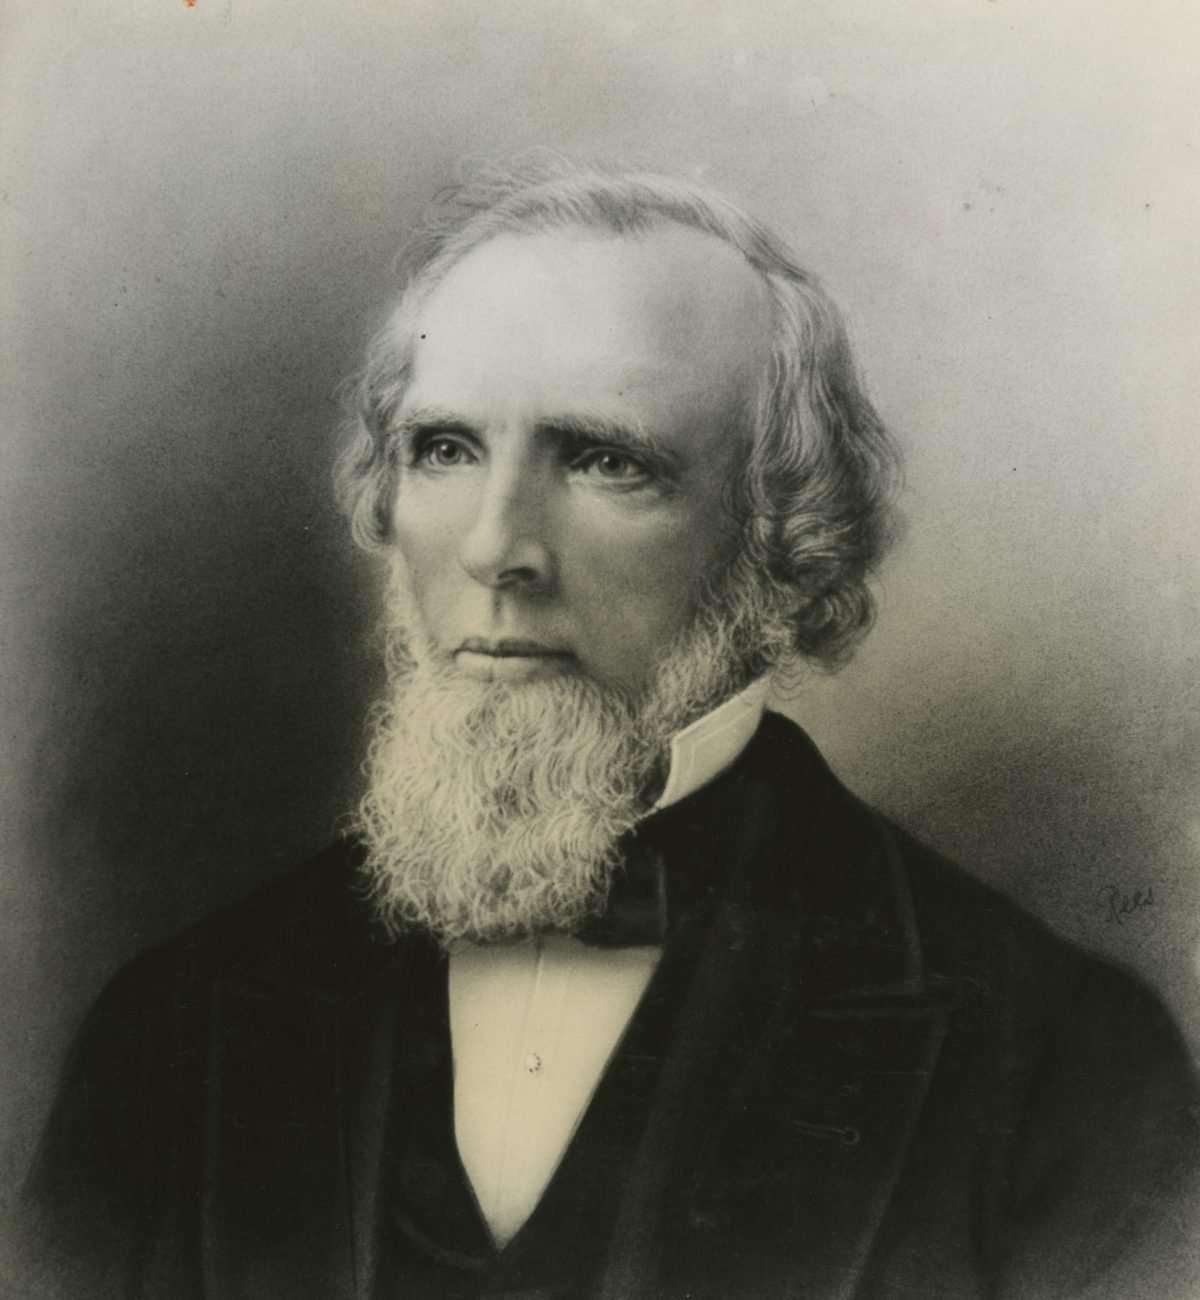 Fletcher H. Archer